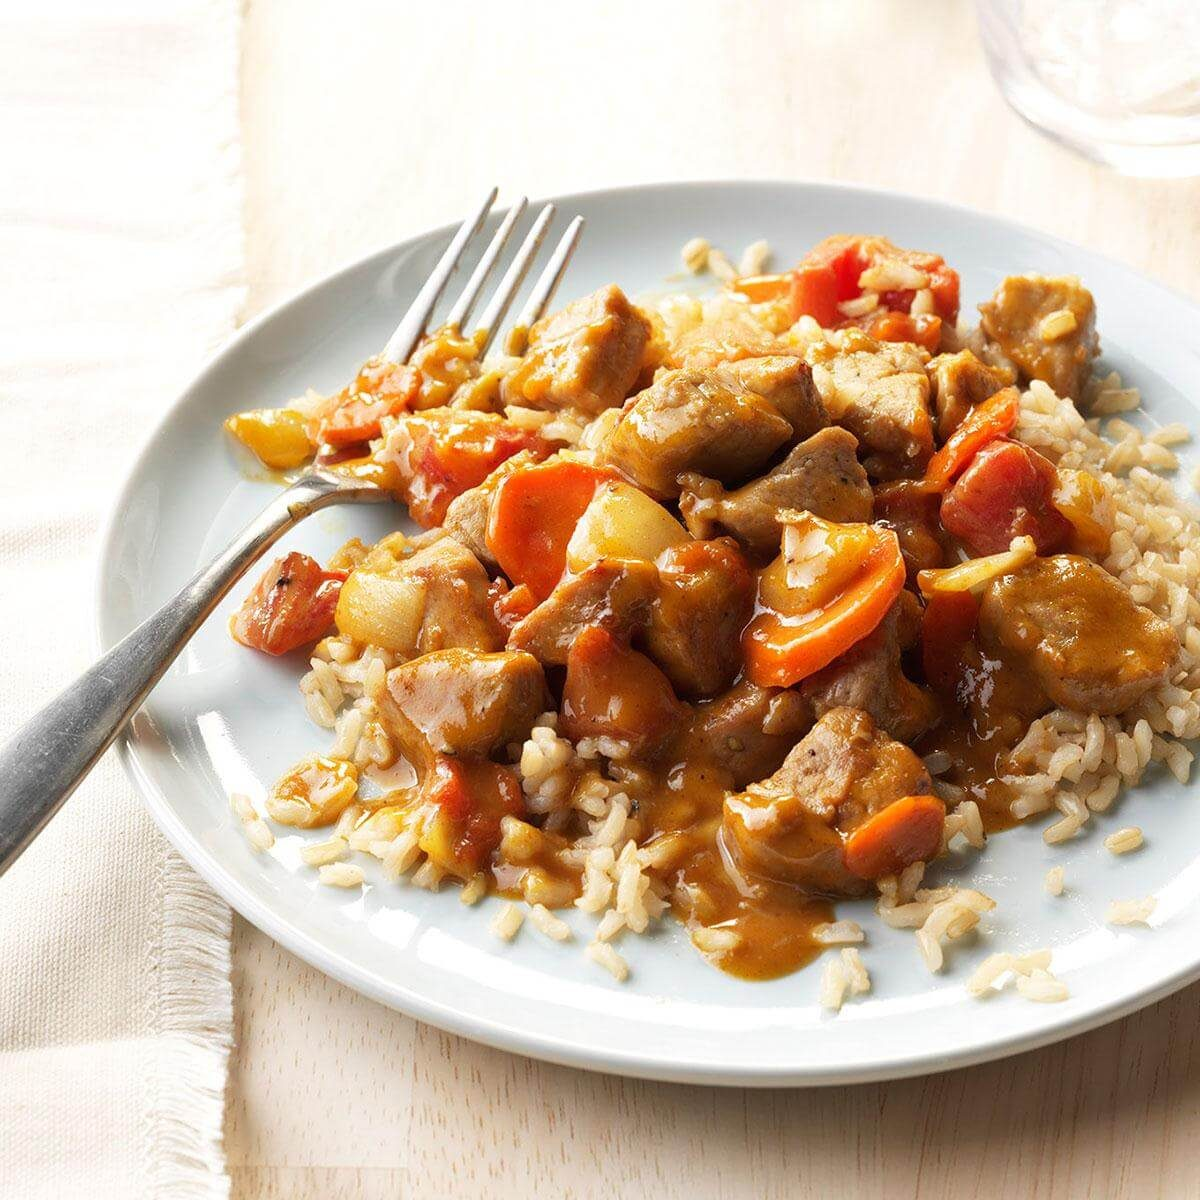 Peanut Butter Pork Curry Recipe | Taste of Home